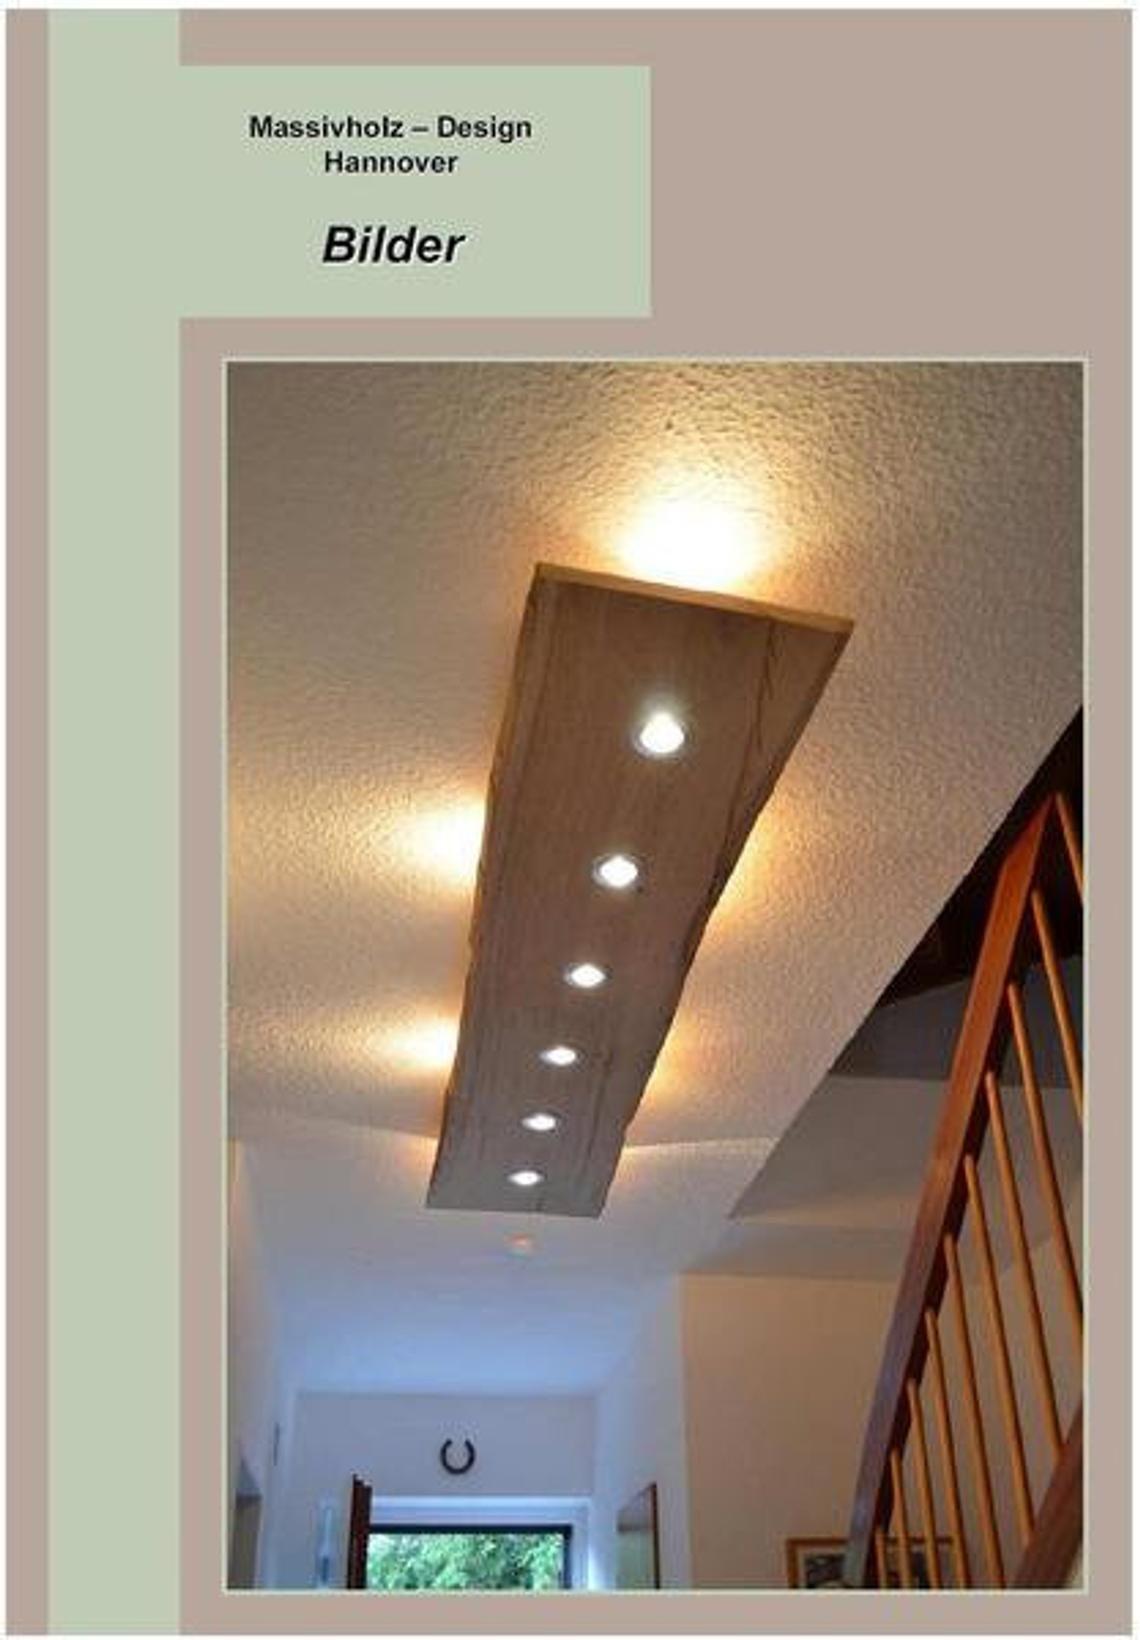 Full Size of Holzlampe Decke Massiv Holz Design Decken Lampe Led In 2020 Lampen Wohnzimmer Deckenlampe Deckenleuchte Bad Schlafzimmer Deckenlampen Für Deckenstrahler Wohnzimmer Holzlampe Decke